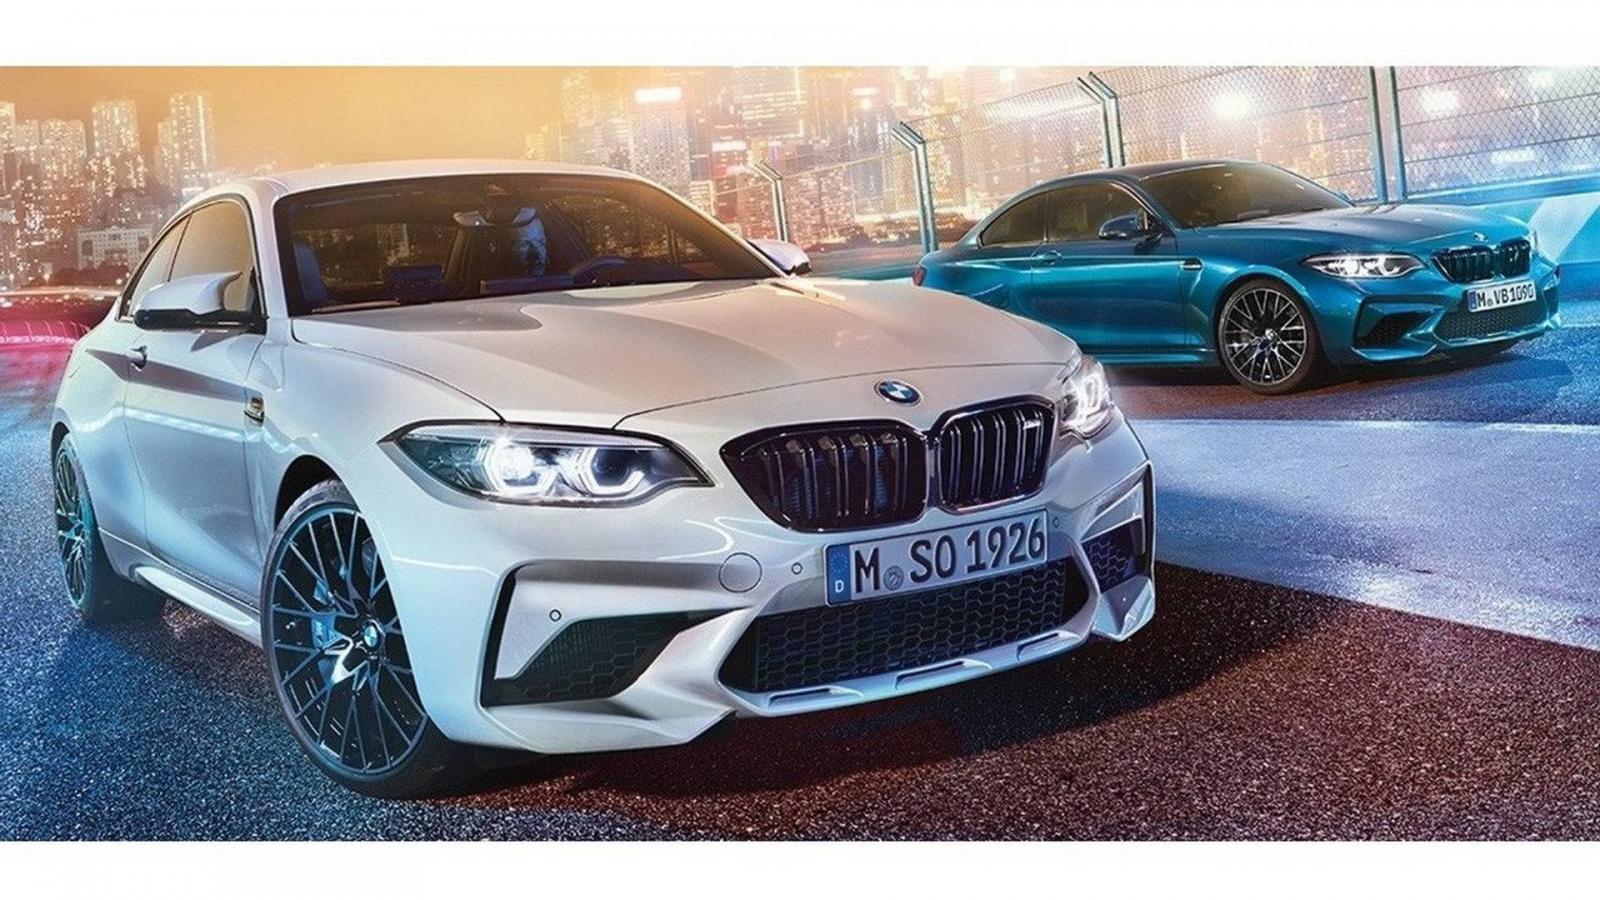 Всети появились характеристики BMW M2